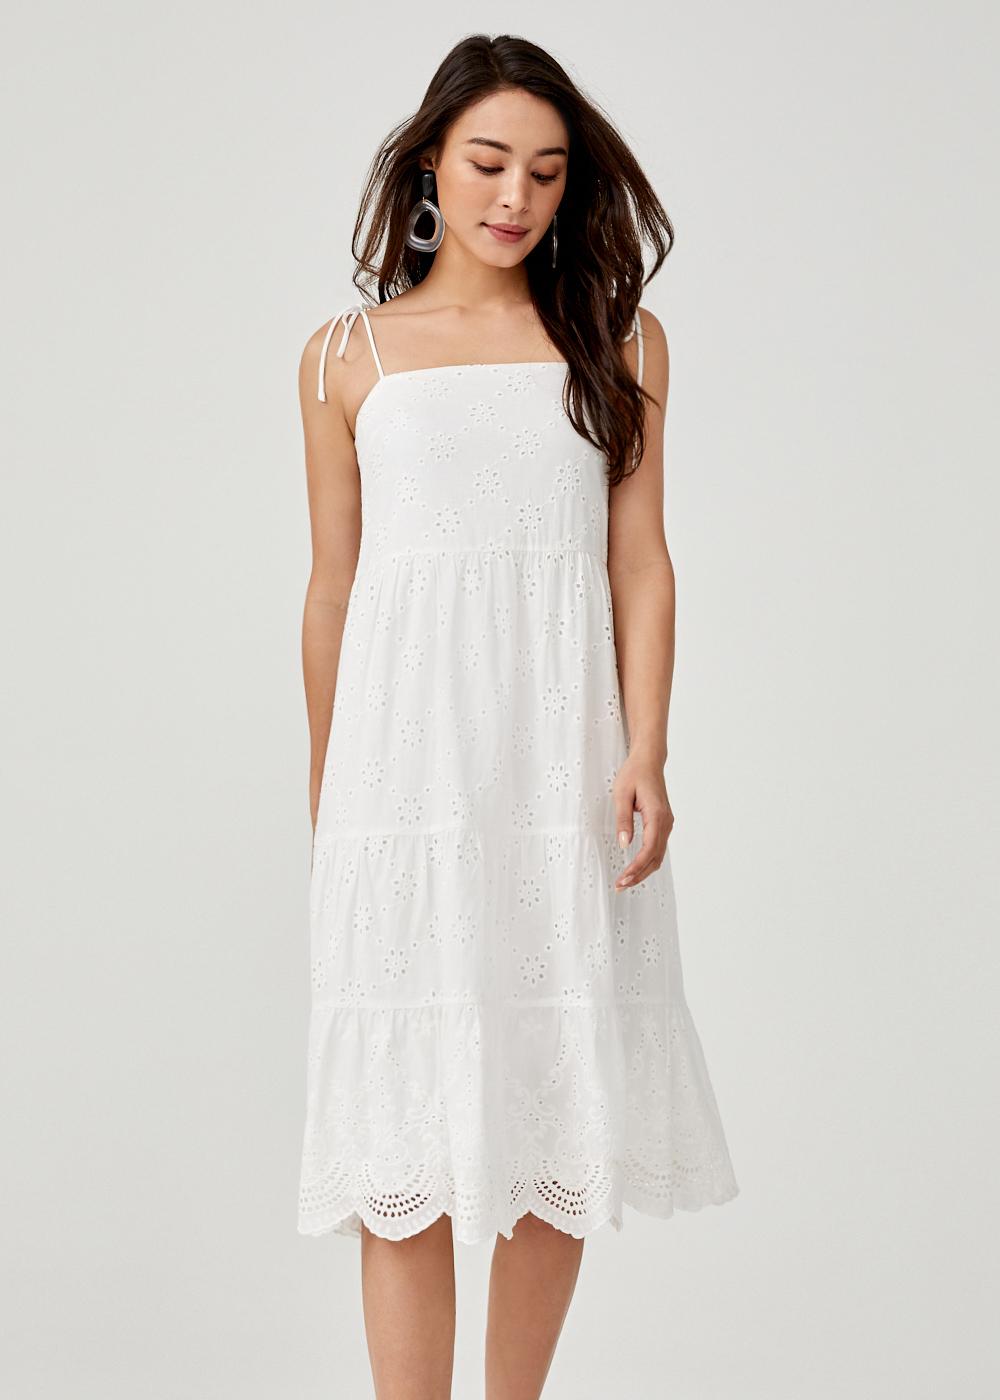 Elpida Broderie Anglaise Ruffle Hem Dress